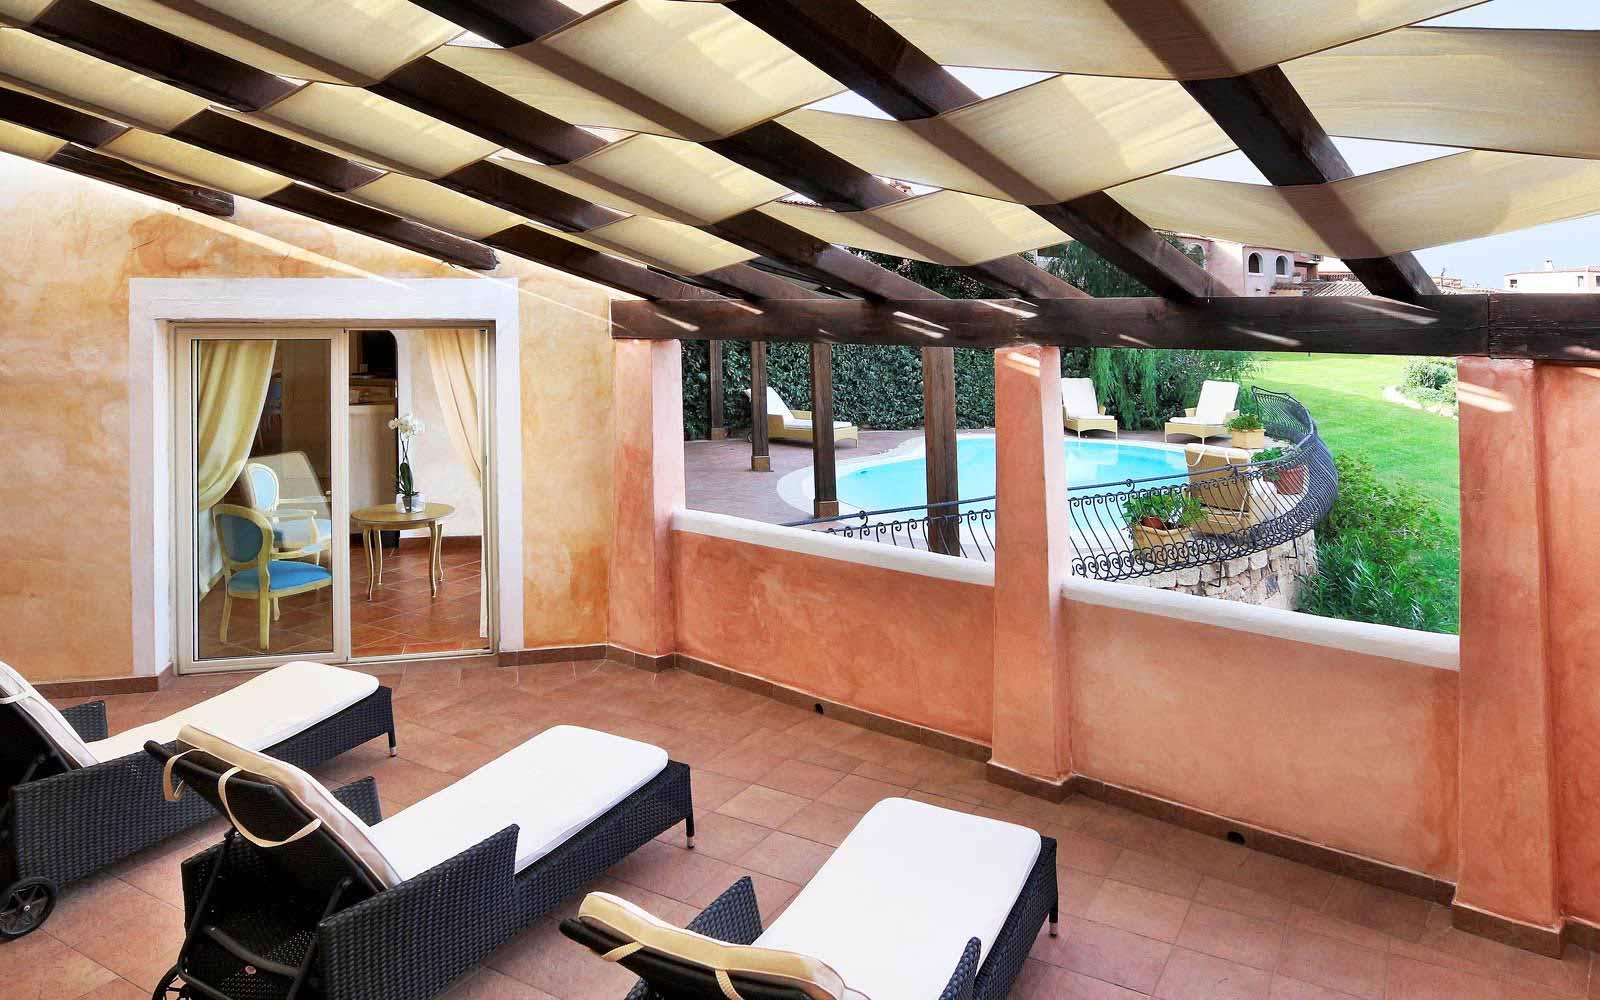 Presidential suite's veranda at Colonna Resort